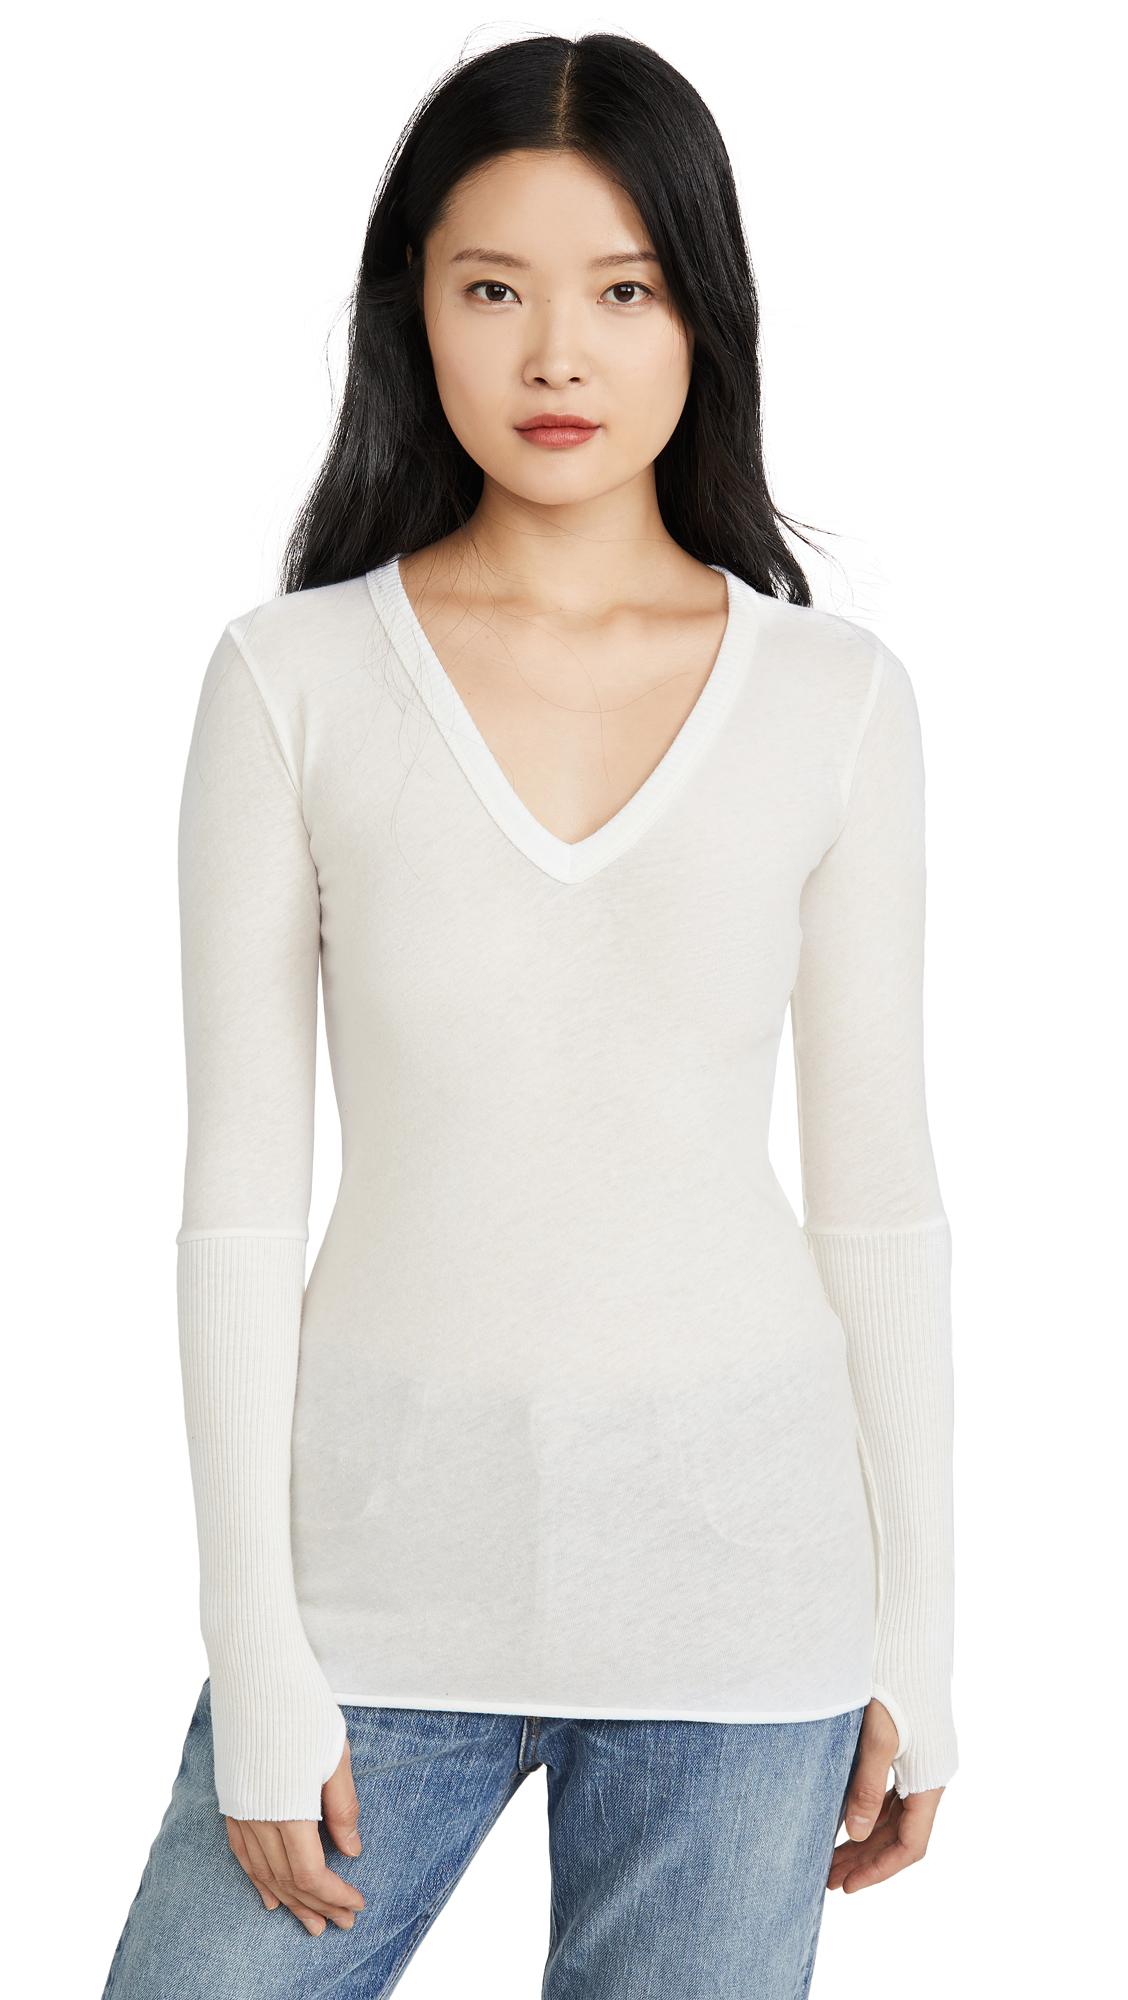 Enza Costa Cuffed V Neck Top In White